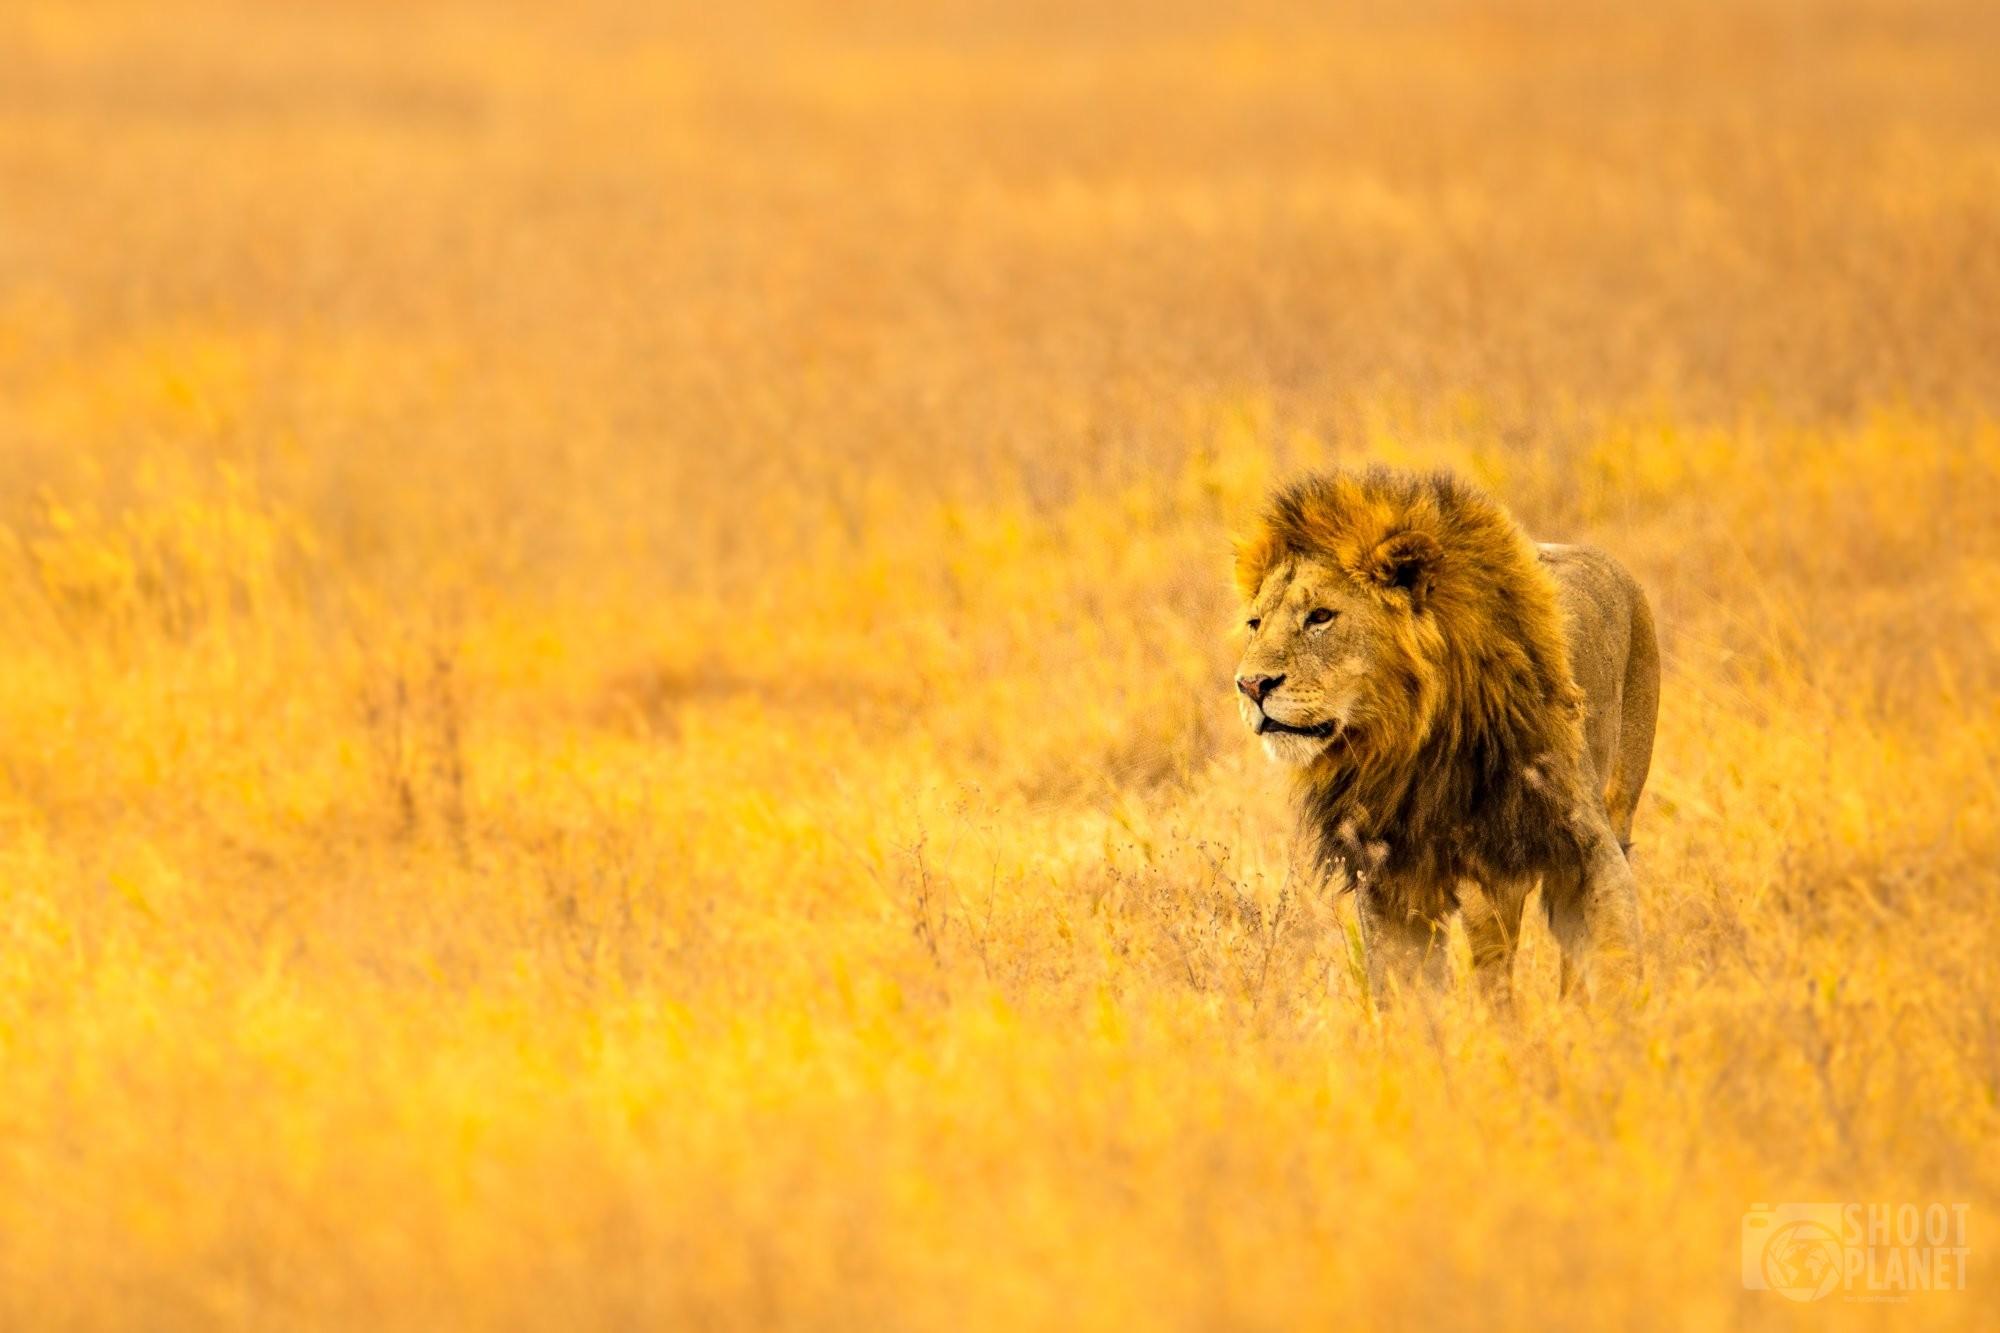 Lion hunting in Ngorongoro caldera, Tanzania